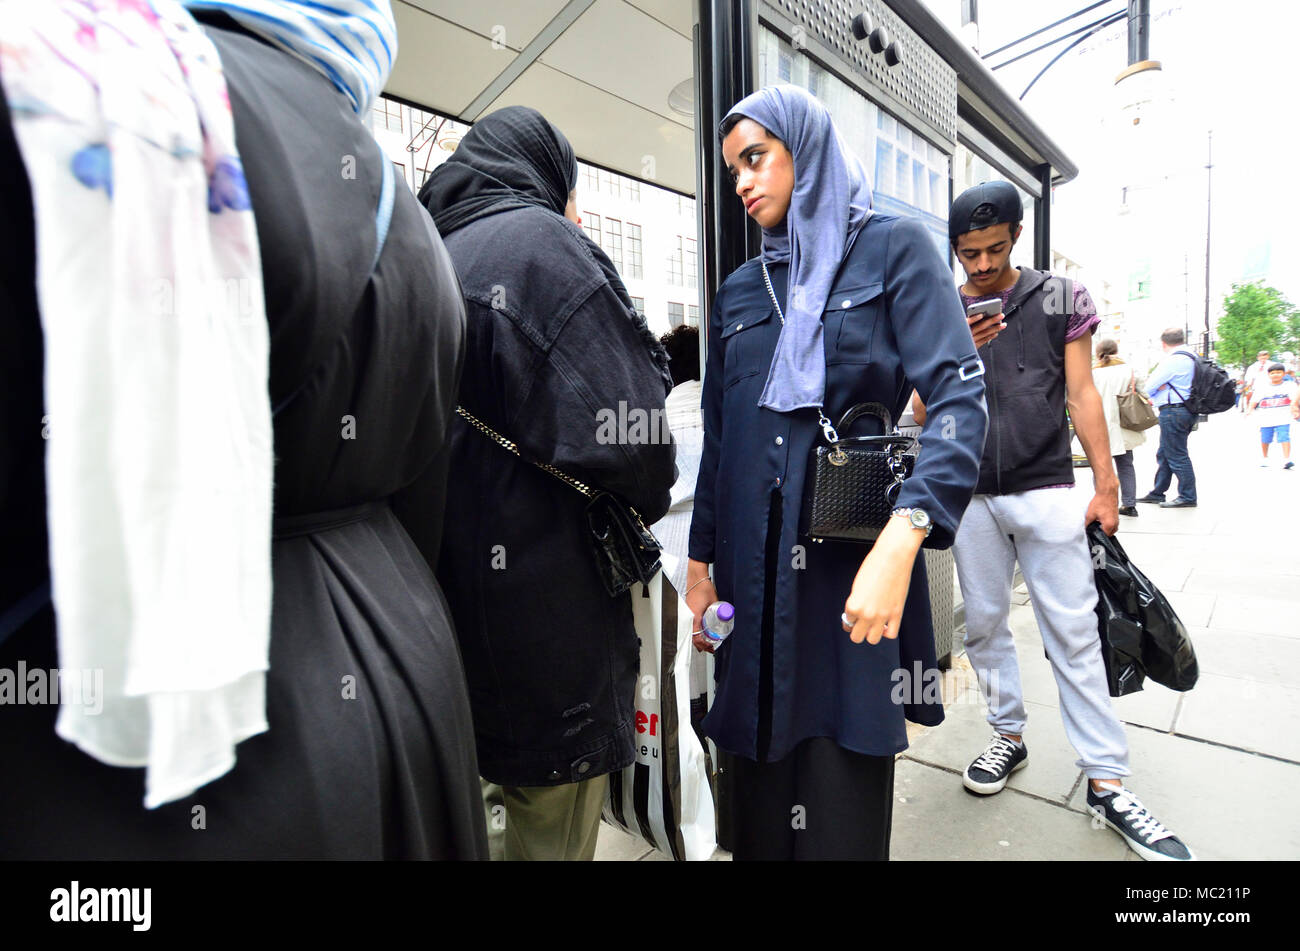 London, England, UK. Muslim women wearing headscarves at a bus stop - Stock Image